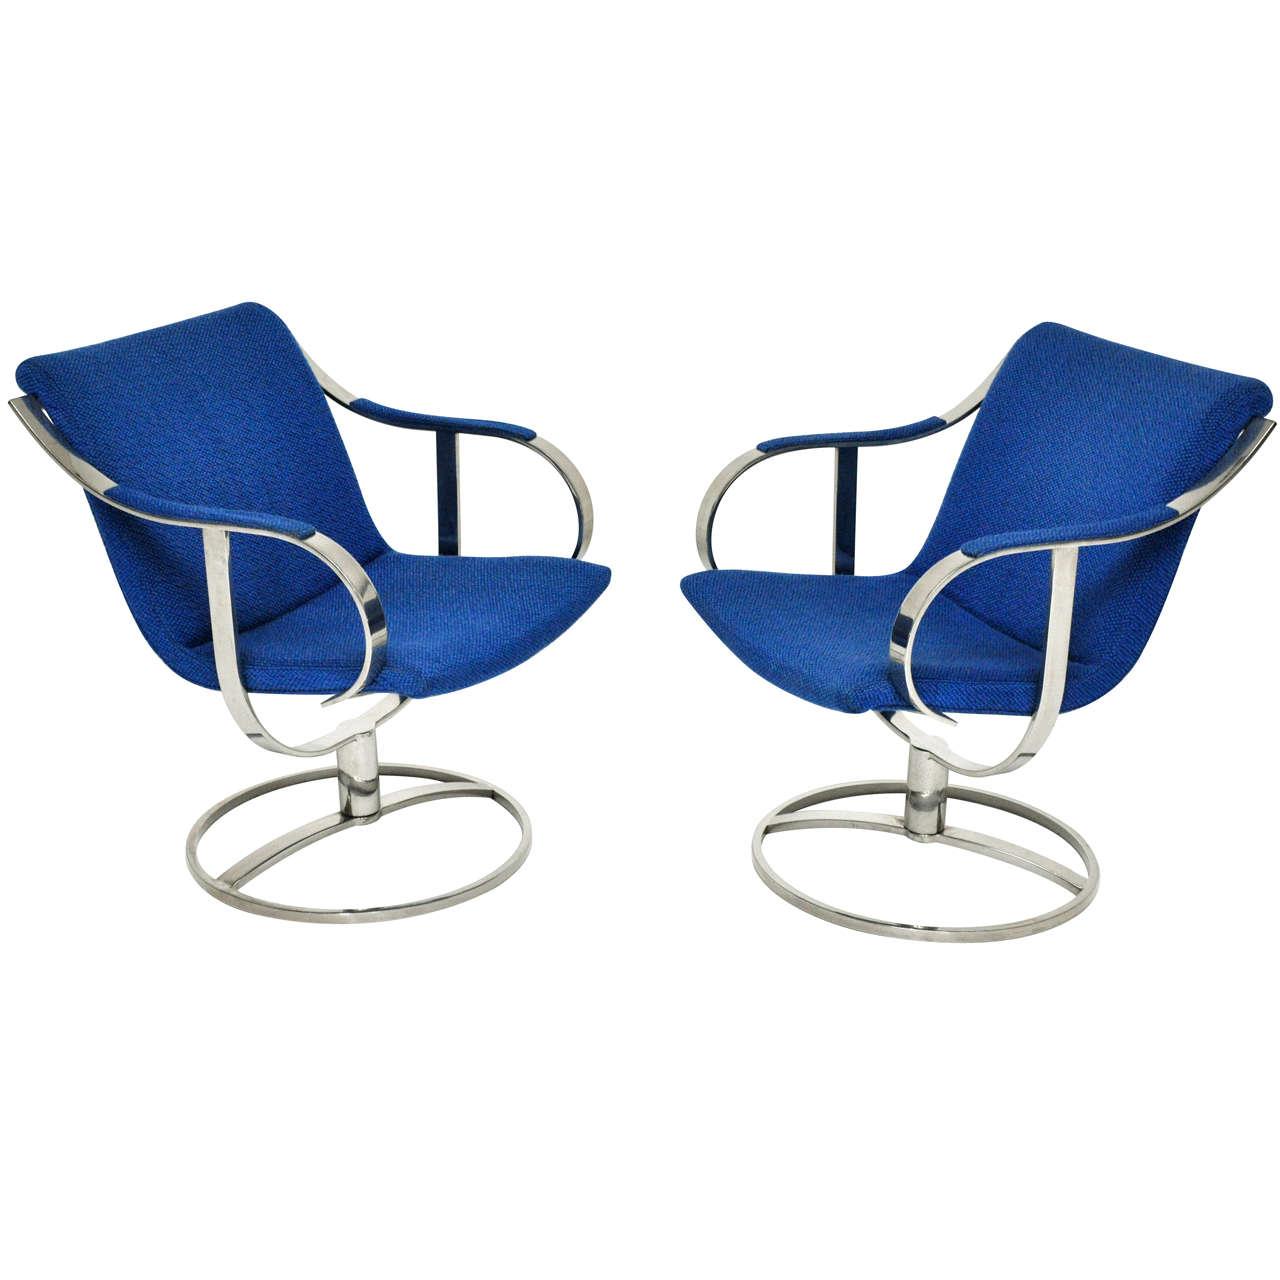 steelcase sofa platner moroccan ebay 1970's swivel lounge chairs at 1stdibs